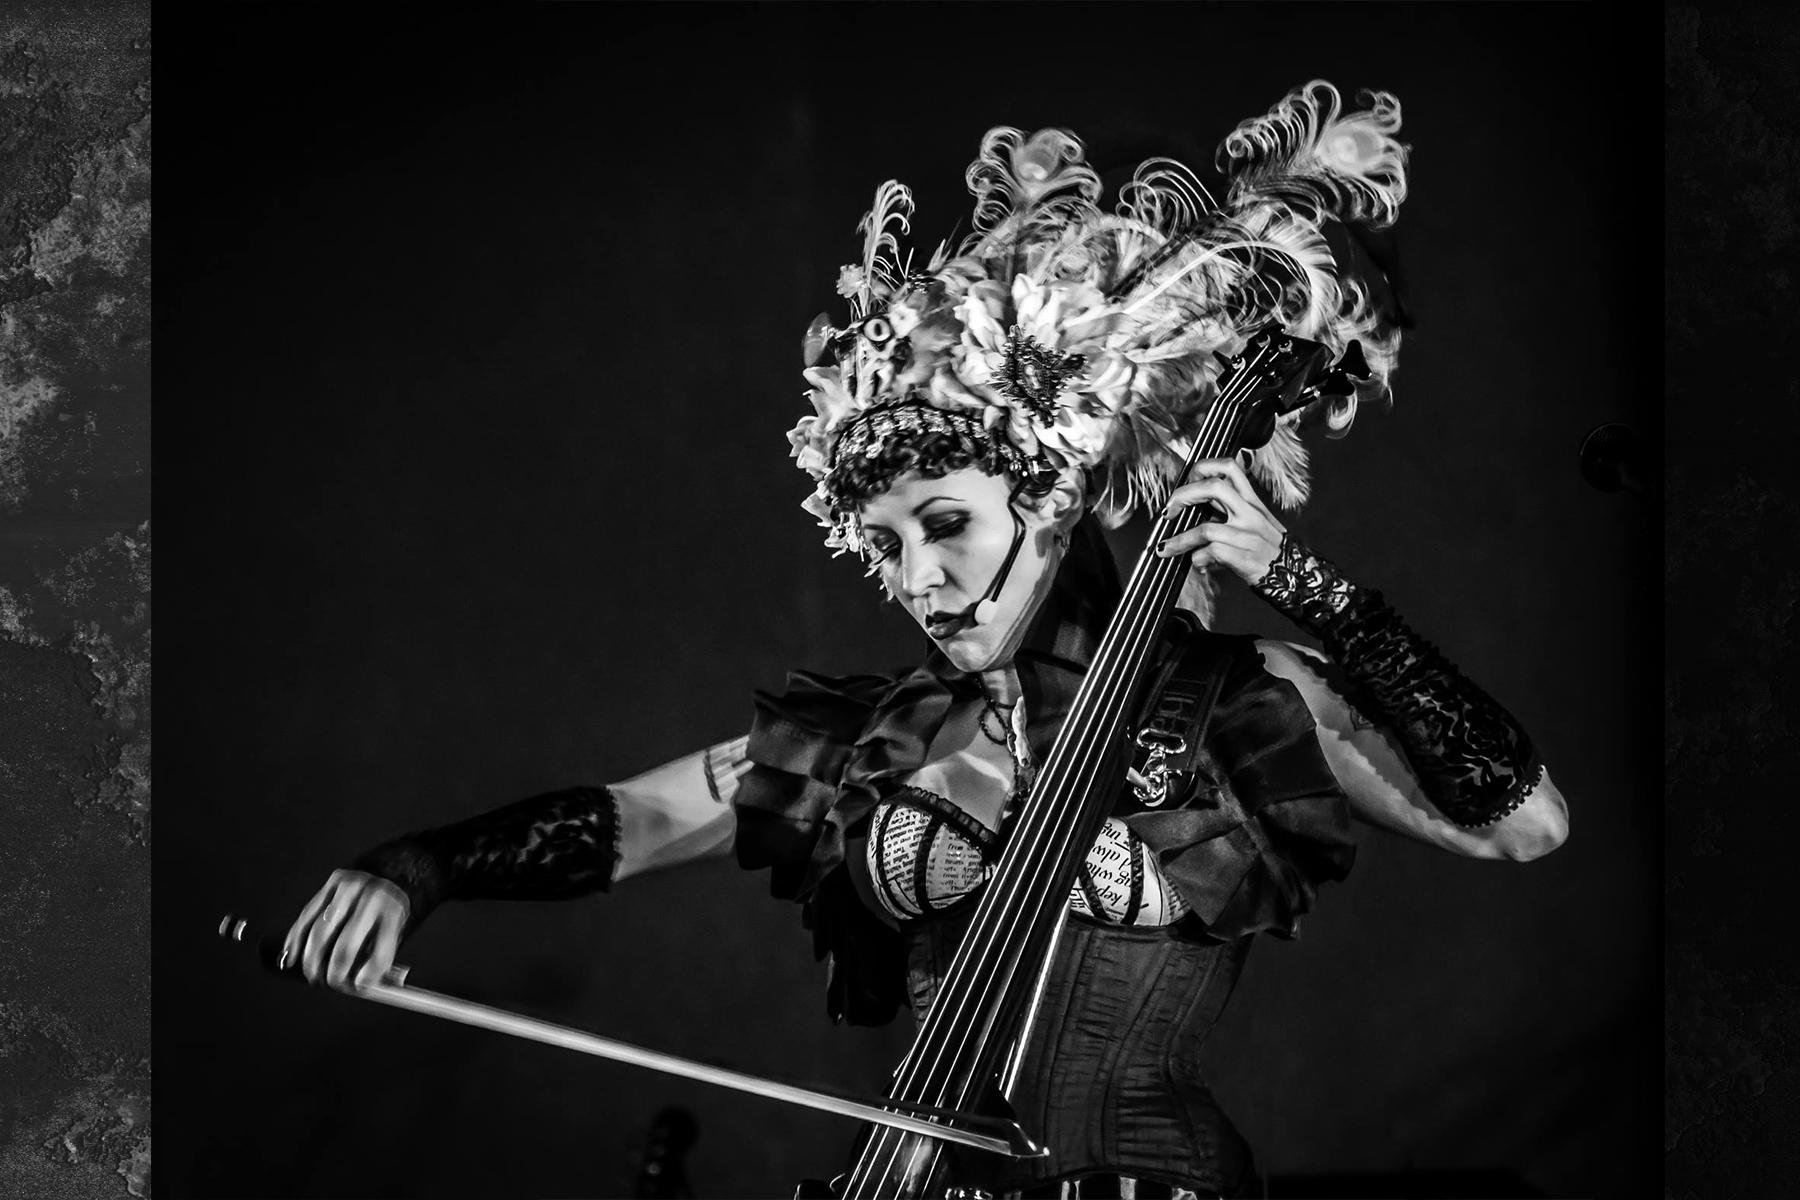 Unwoman - Cello siren extraordinaire!LOCATION: HEART LODGE